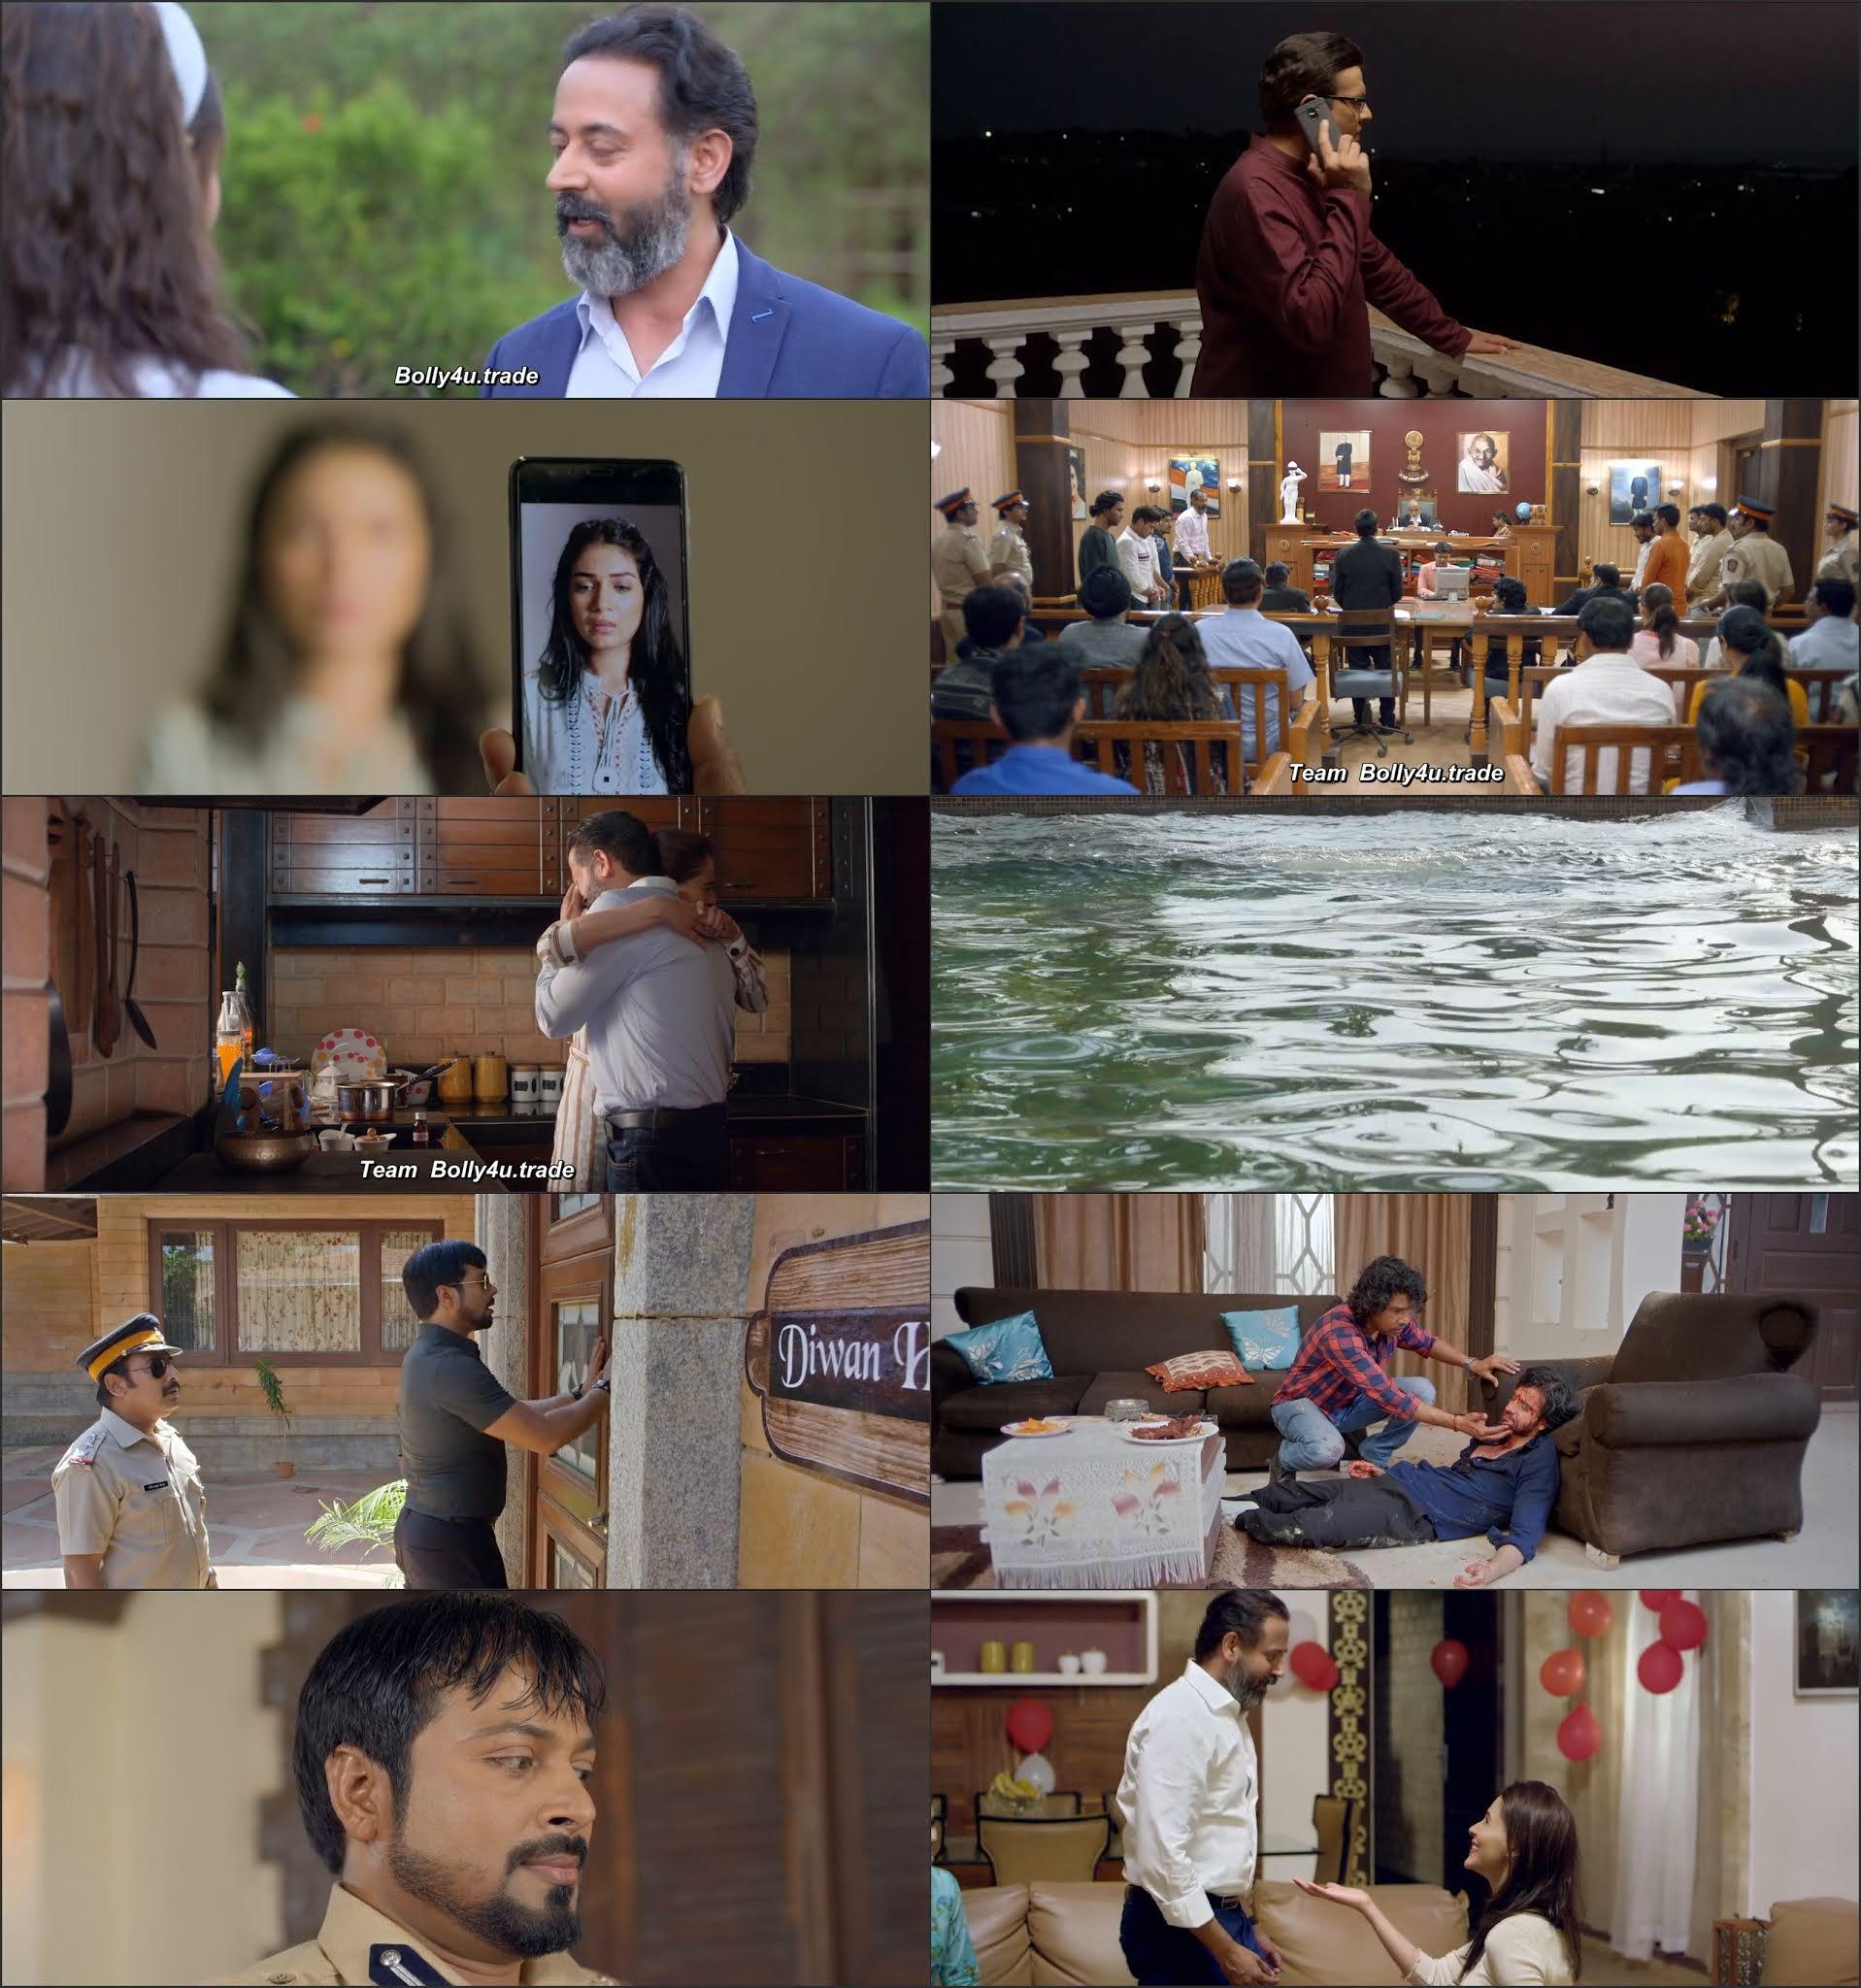 Scotland 2020 WEB-DL 800MB Hindi Movie Download 720p